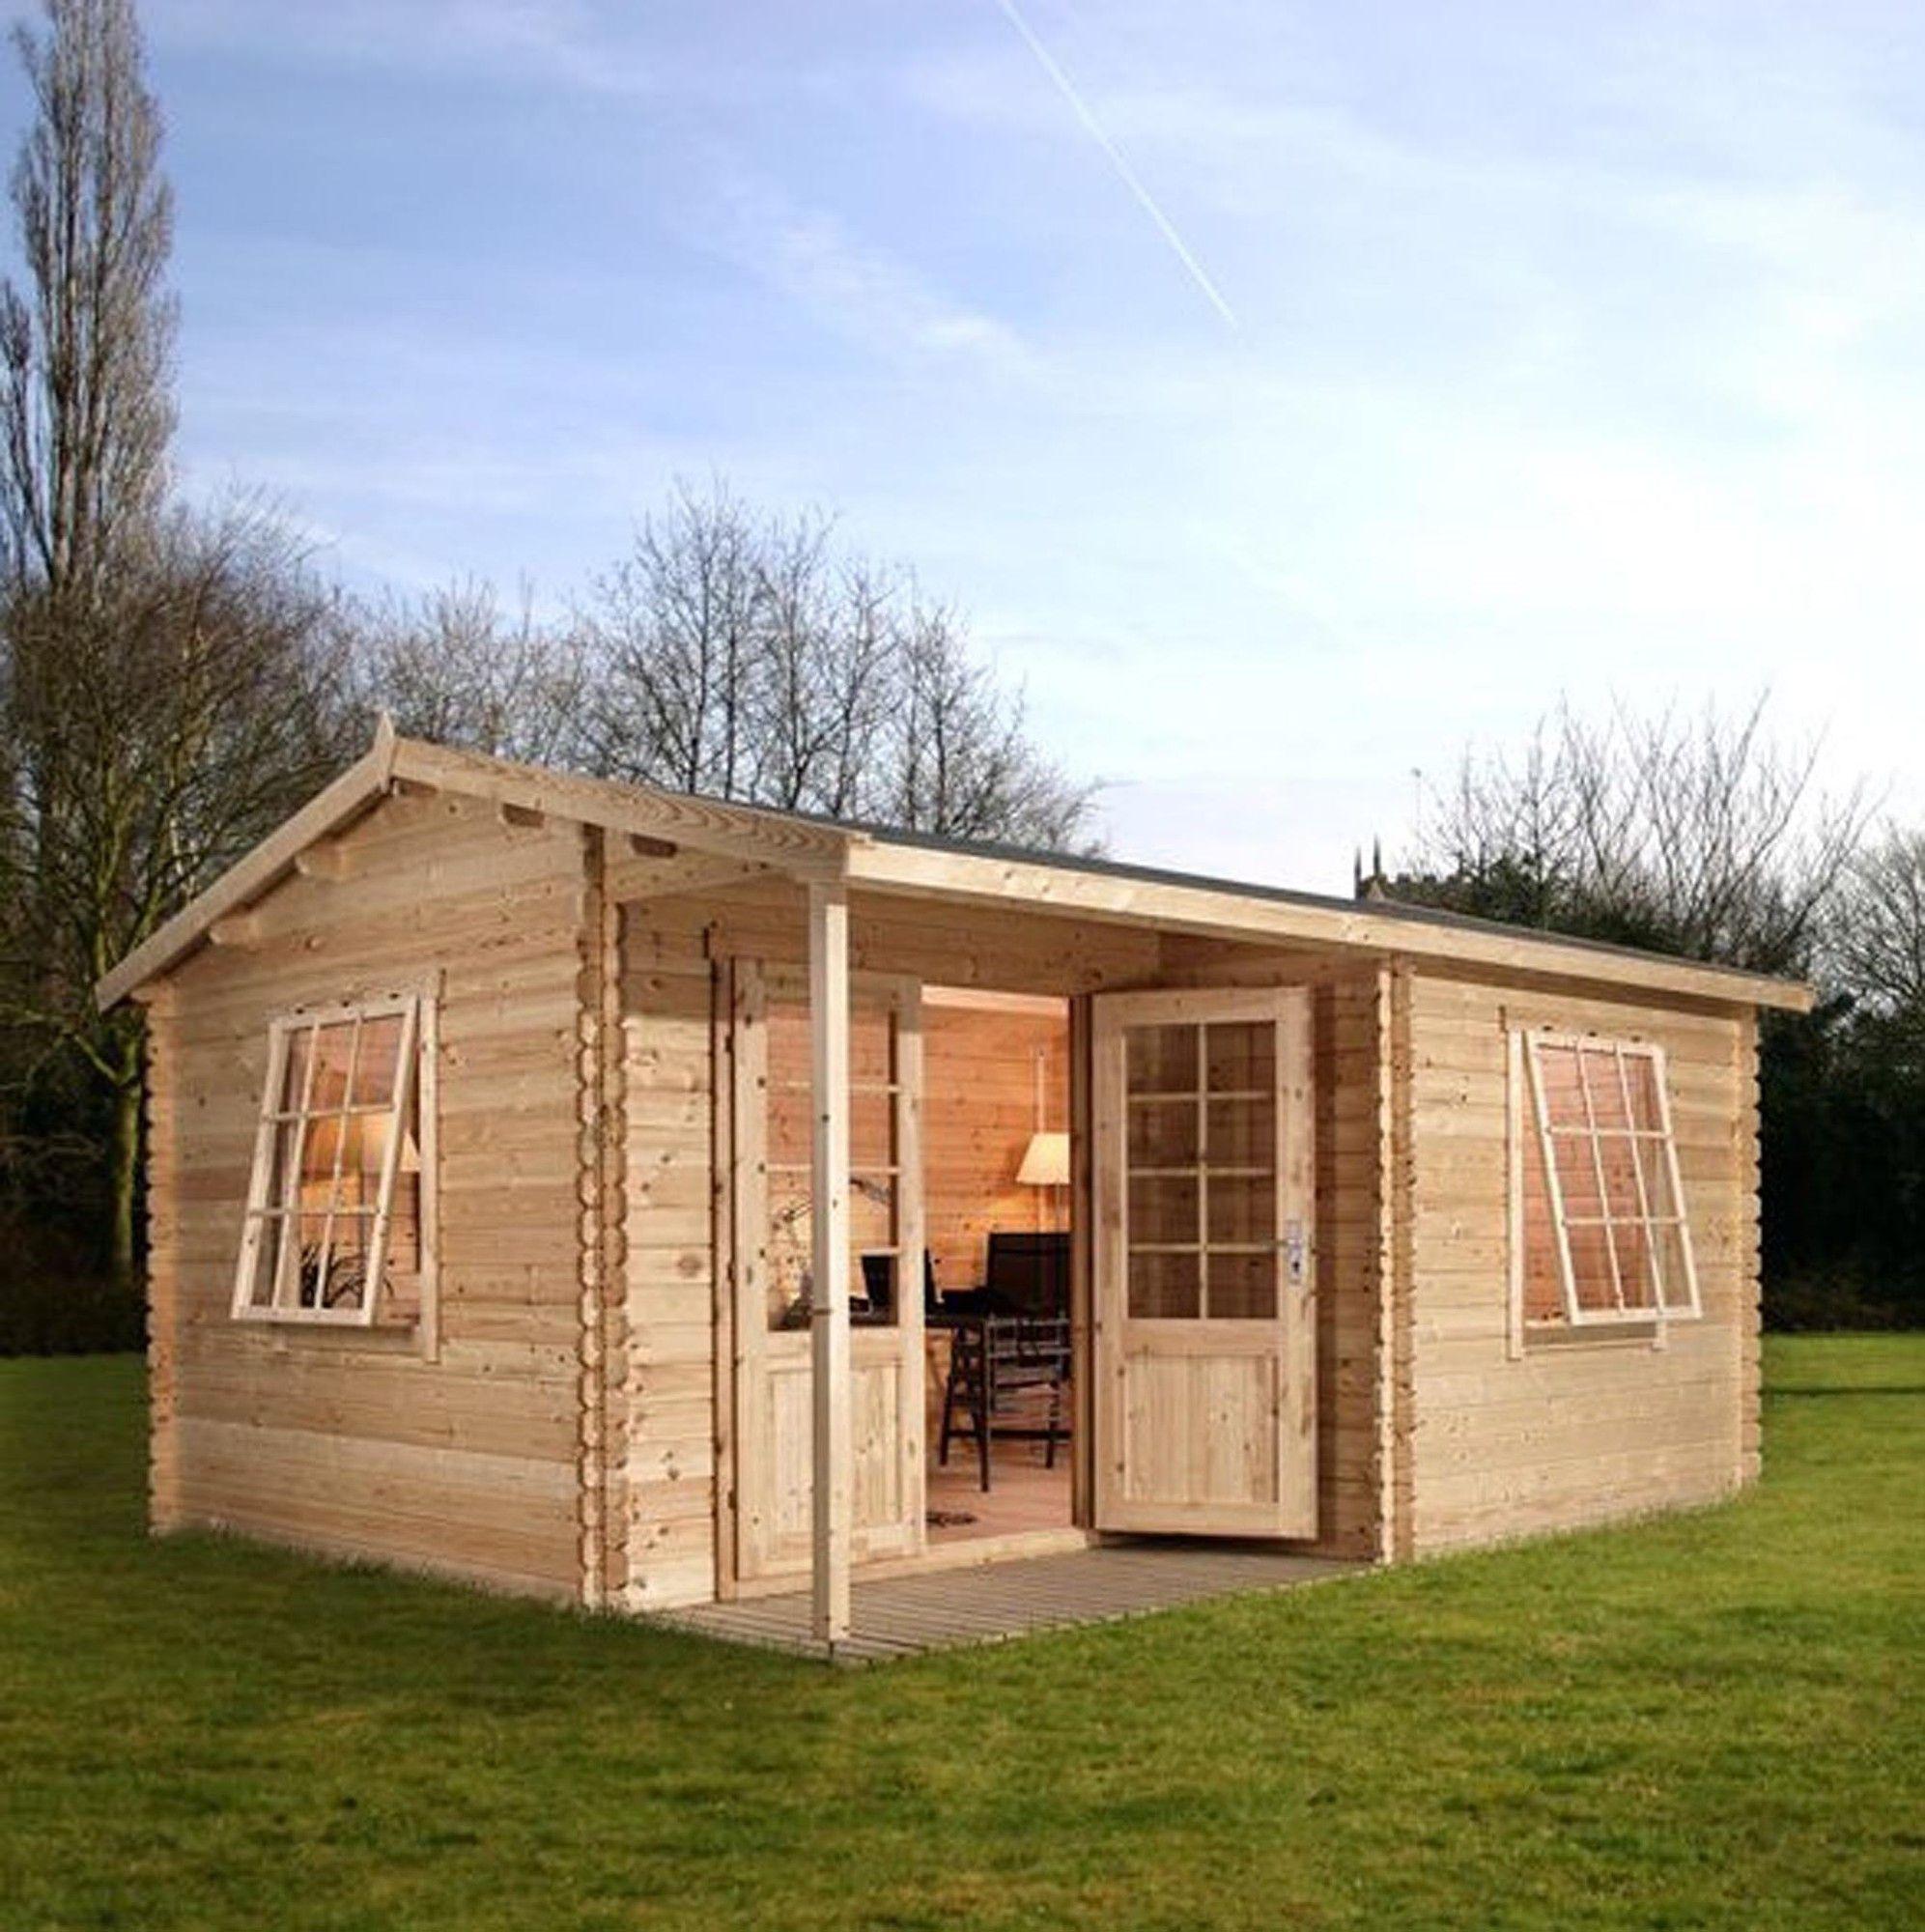 Home Office Executive Log Cabin With Double Door Wayfair Uk Diy House Plans Cabin Kits Diy Cabin